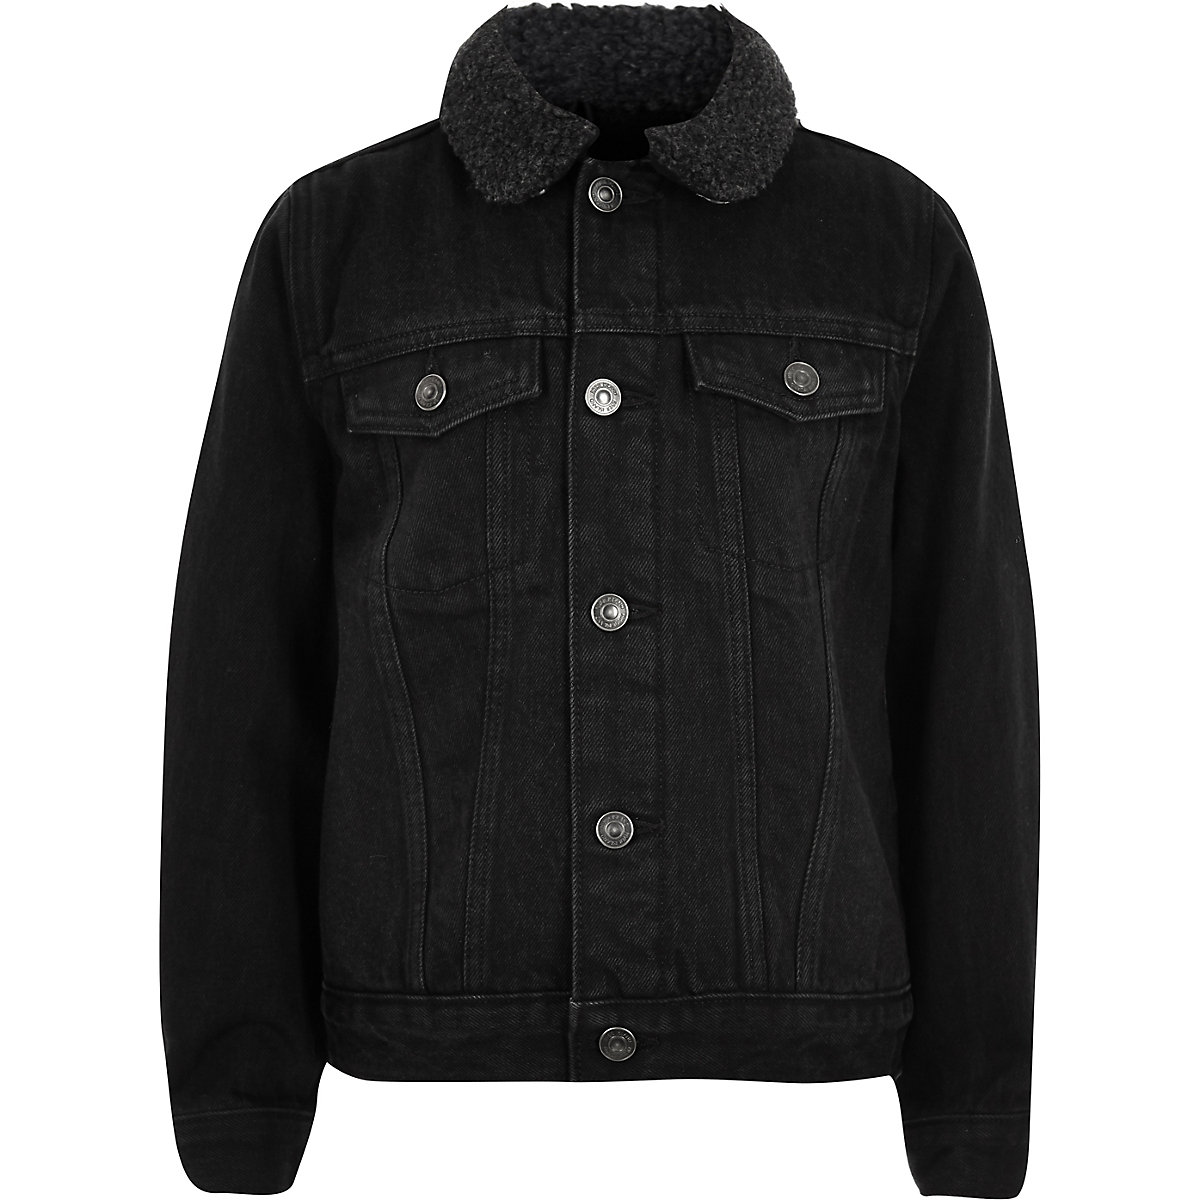 Boys black wash fleece lined denim jacket